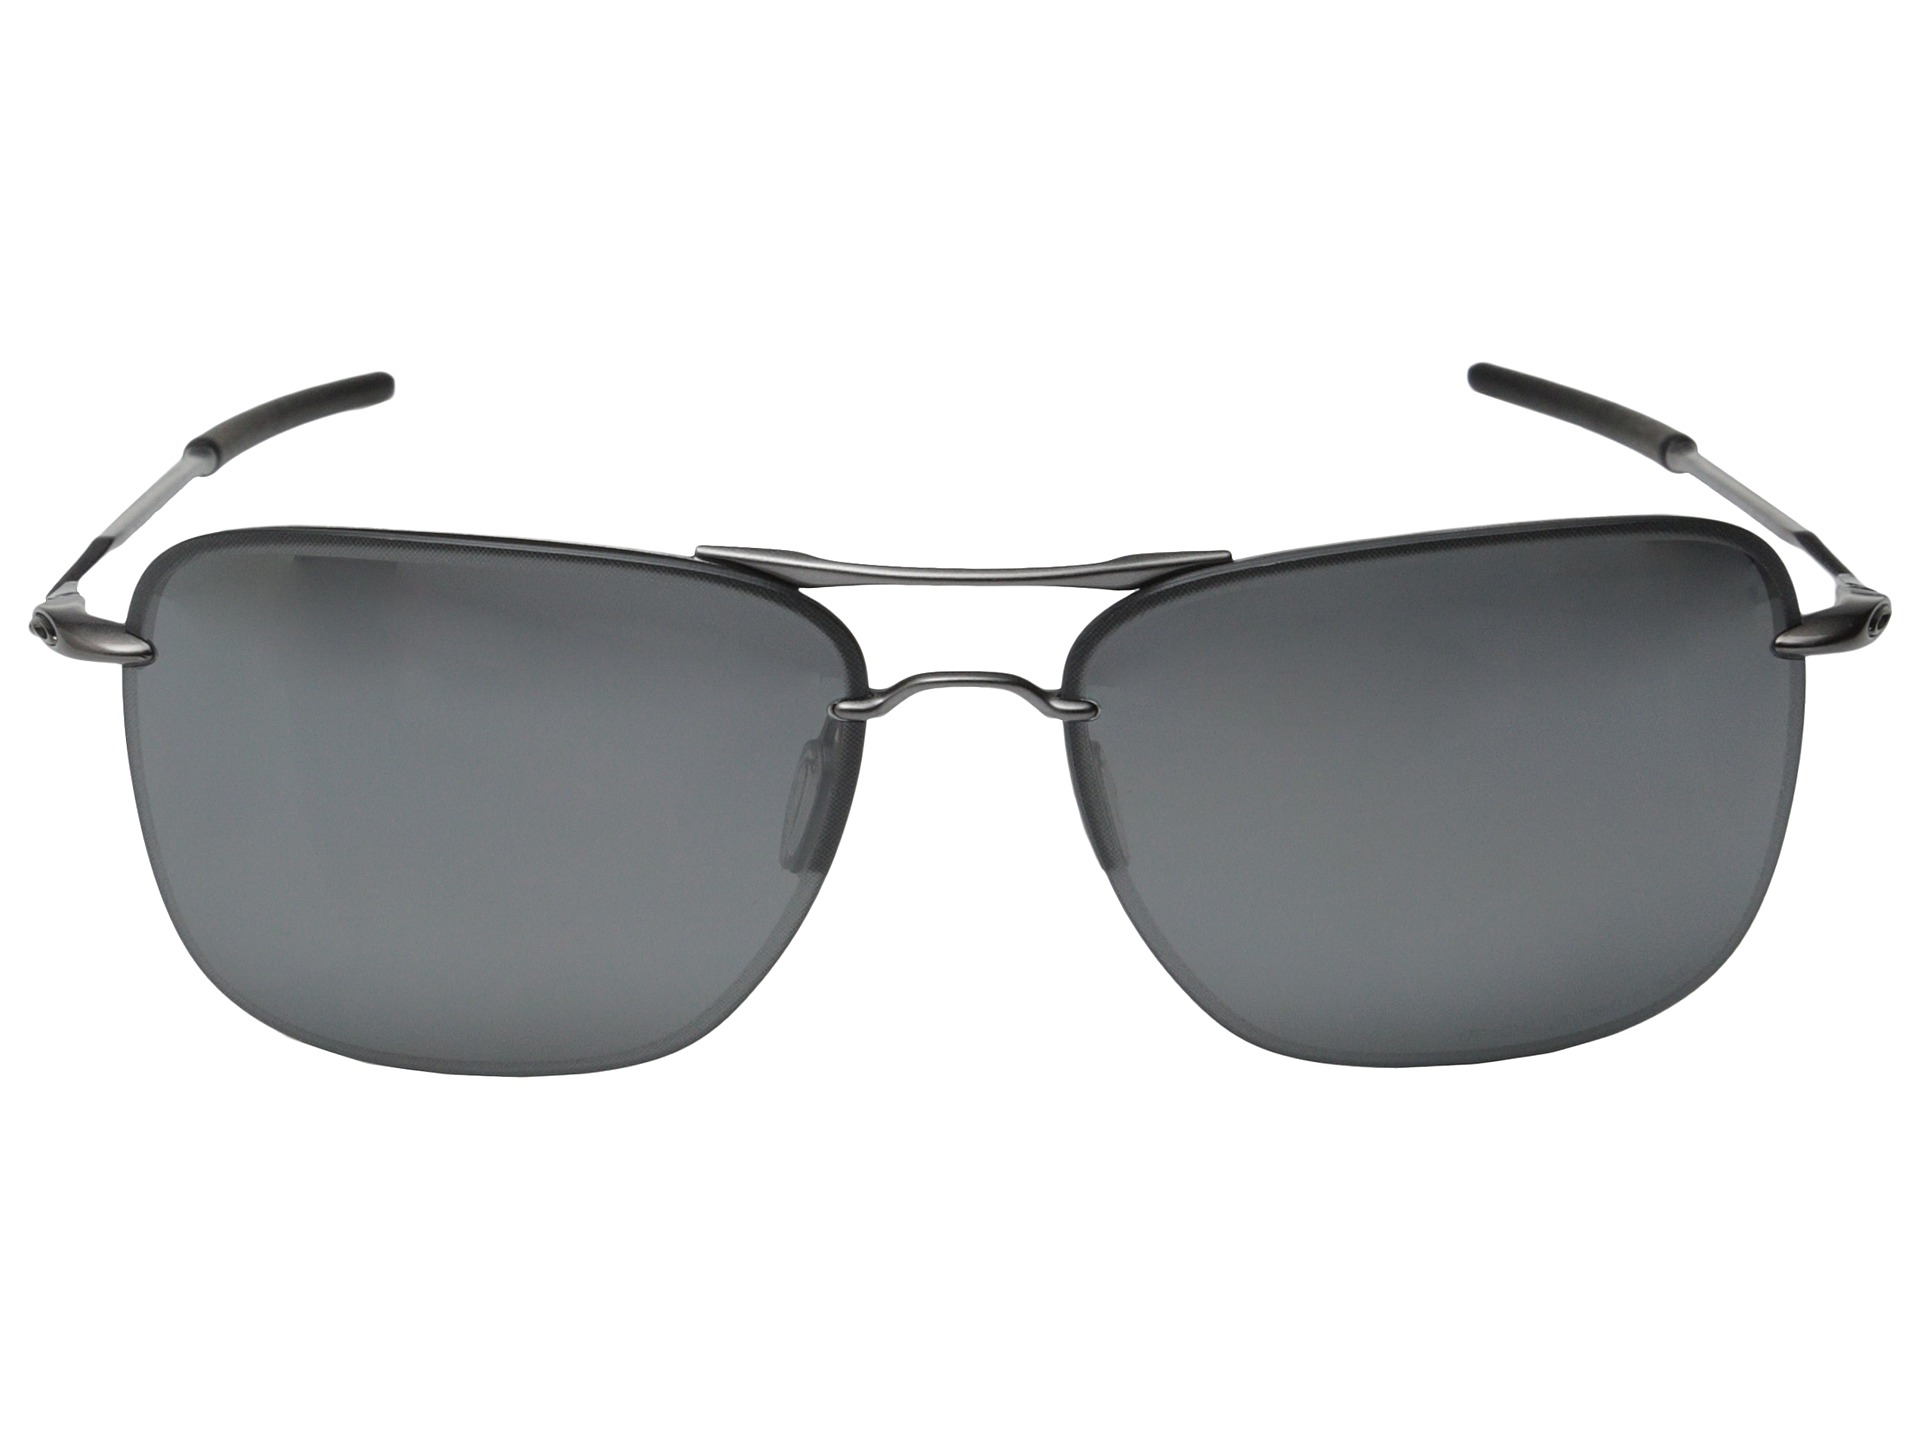 Designer Glasses Frames Las Vegas : Las Vegas Oakley Sunglasses